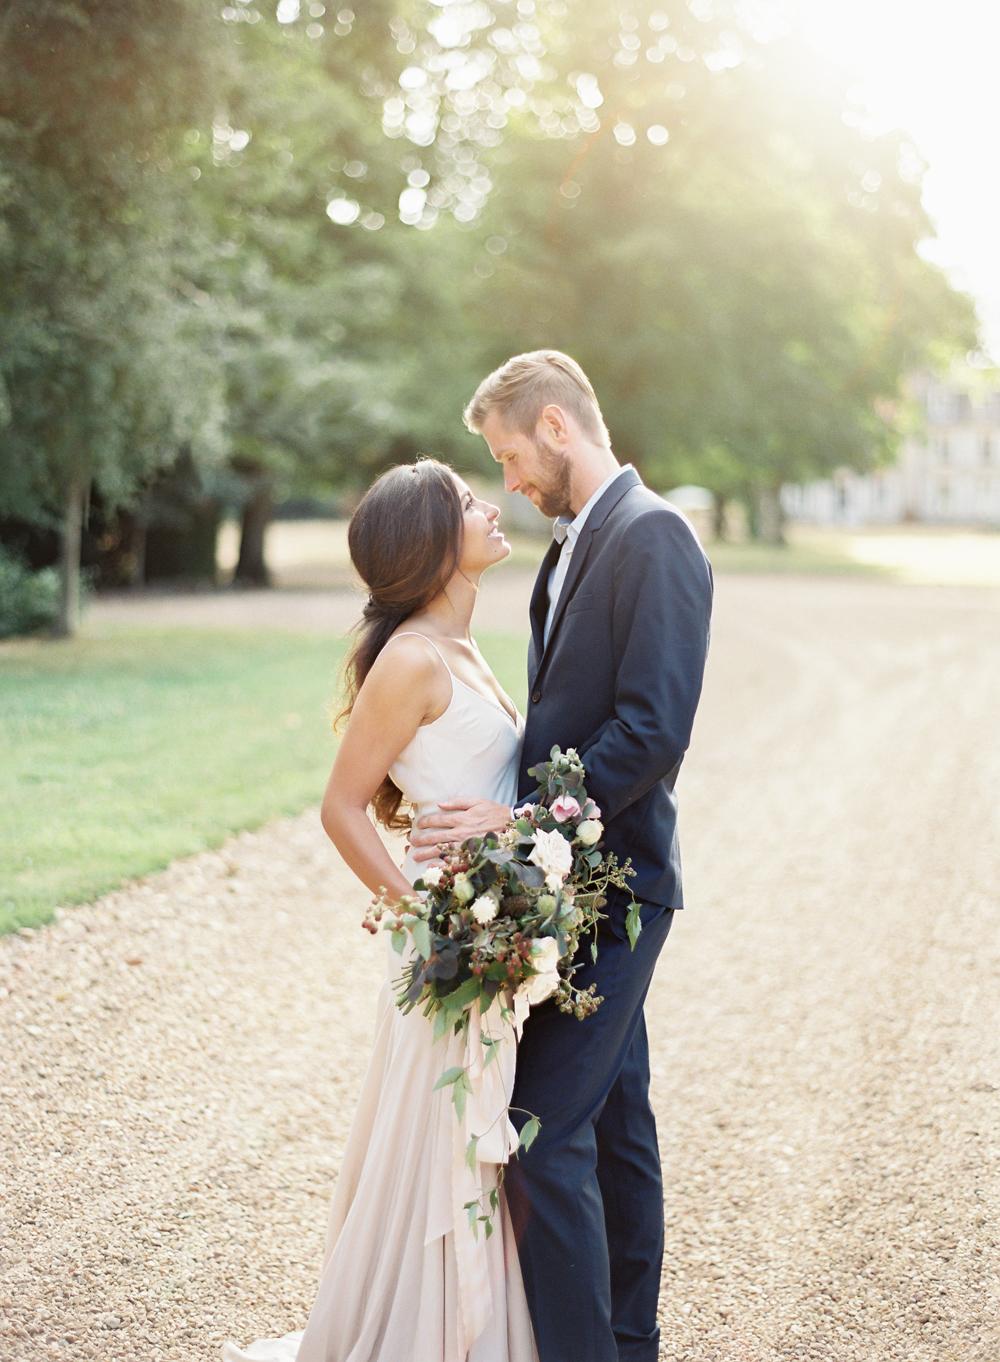 Vicki Grafton Photography Paris France Chateau wedding  Film Wedding photographer -1-2.jpg